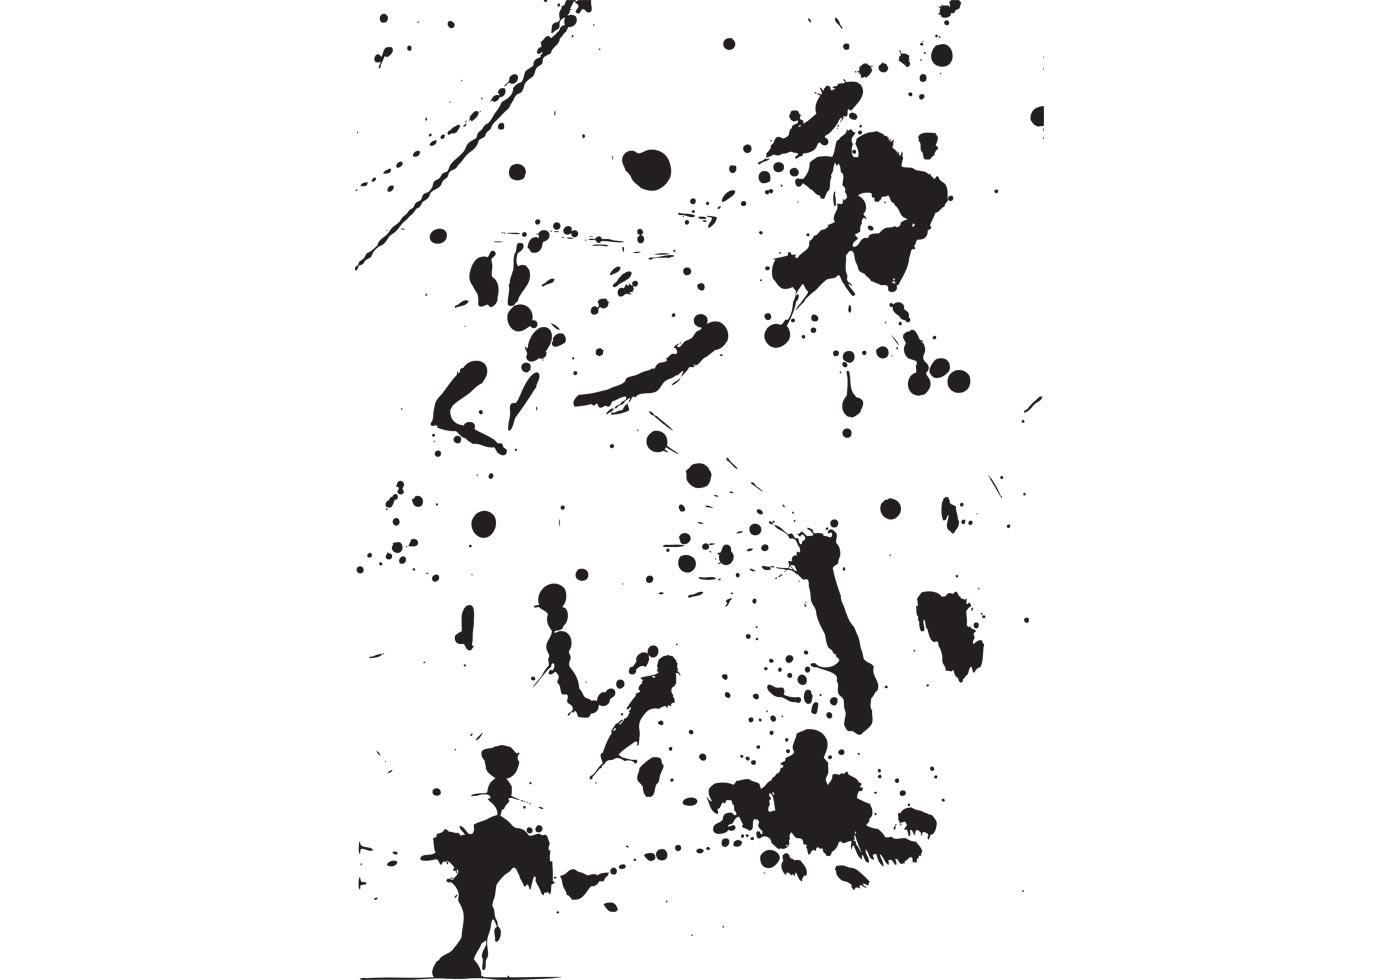 Free Paint Splatters Amp Spills Vectors